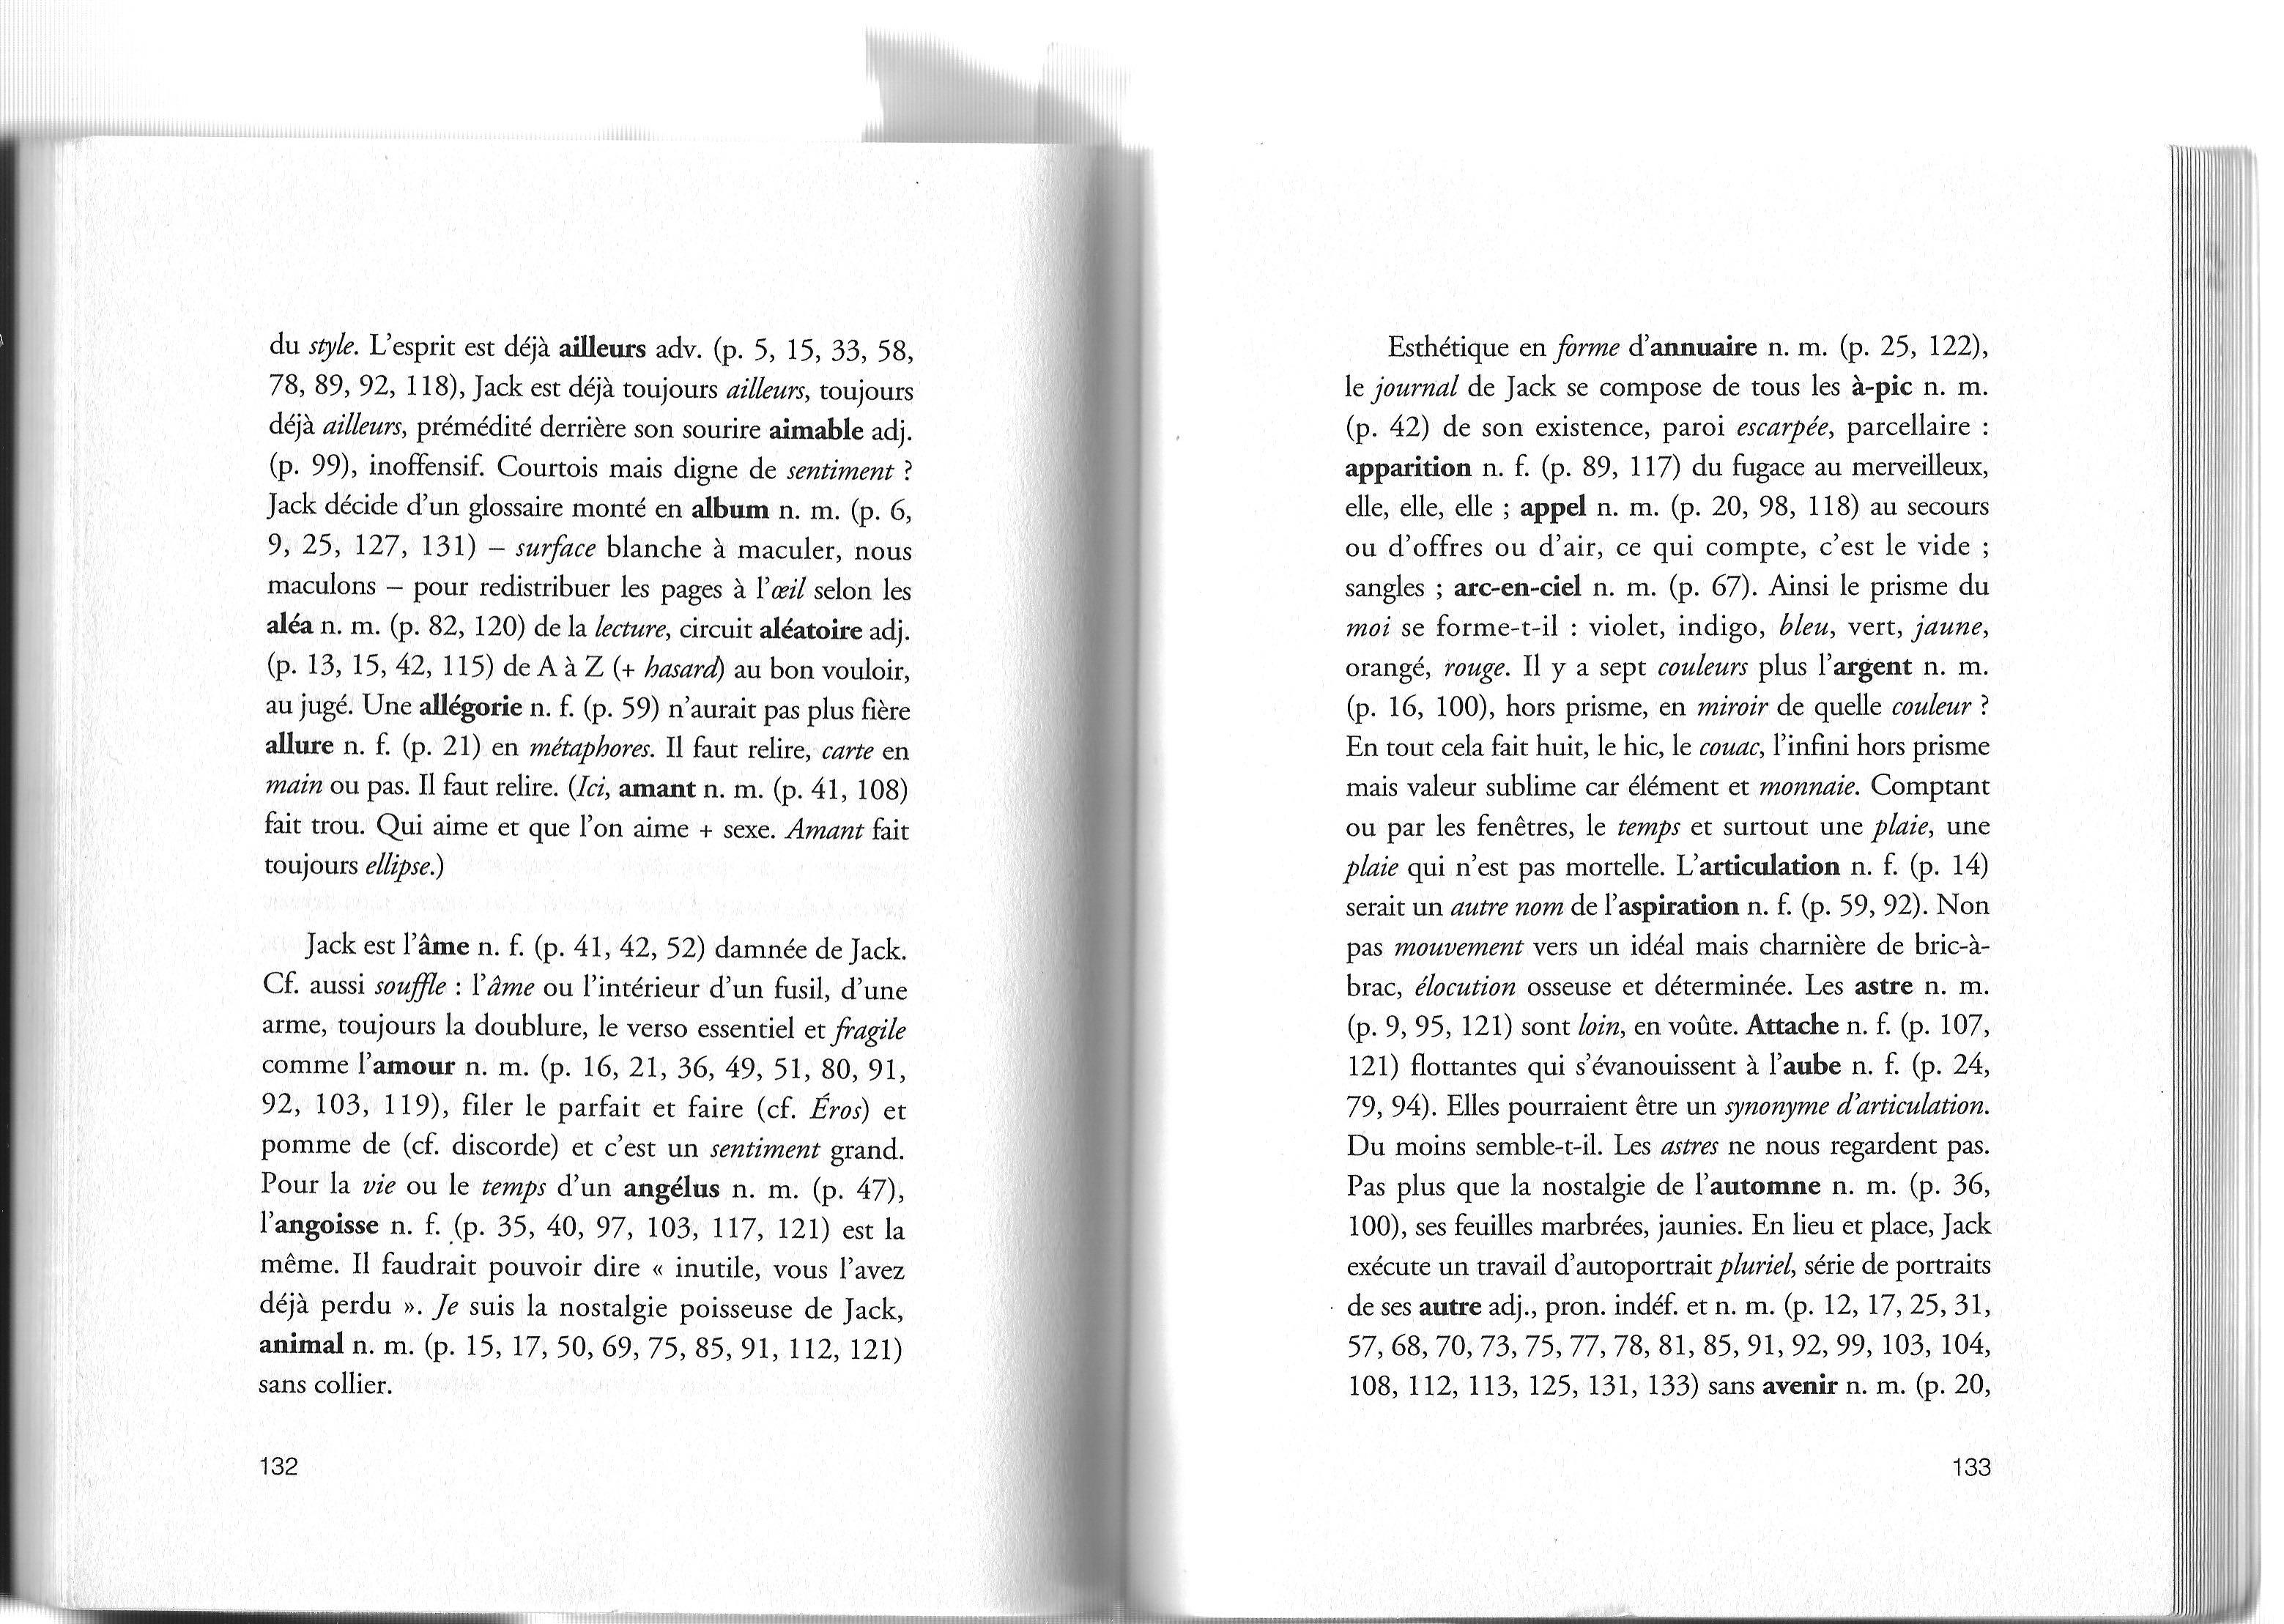 Jacques_LIMONGI_AlDante_P132-133